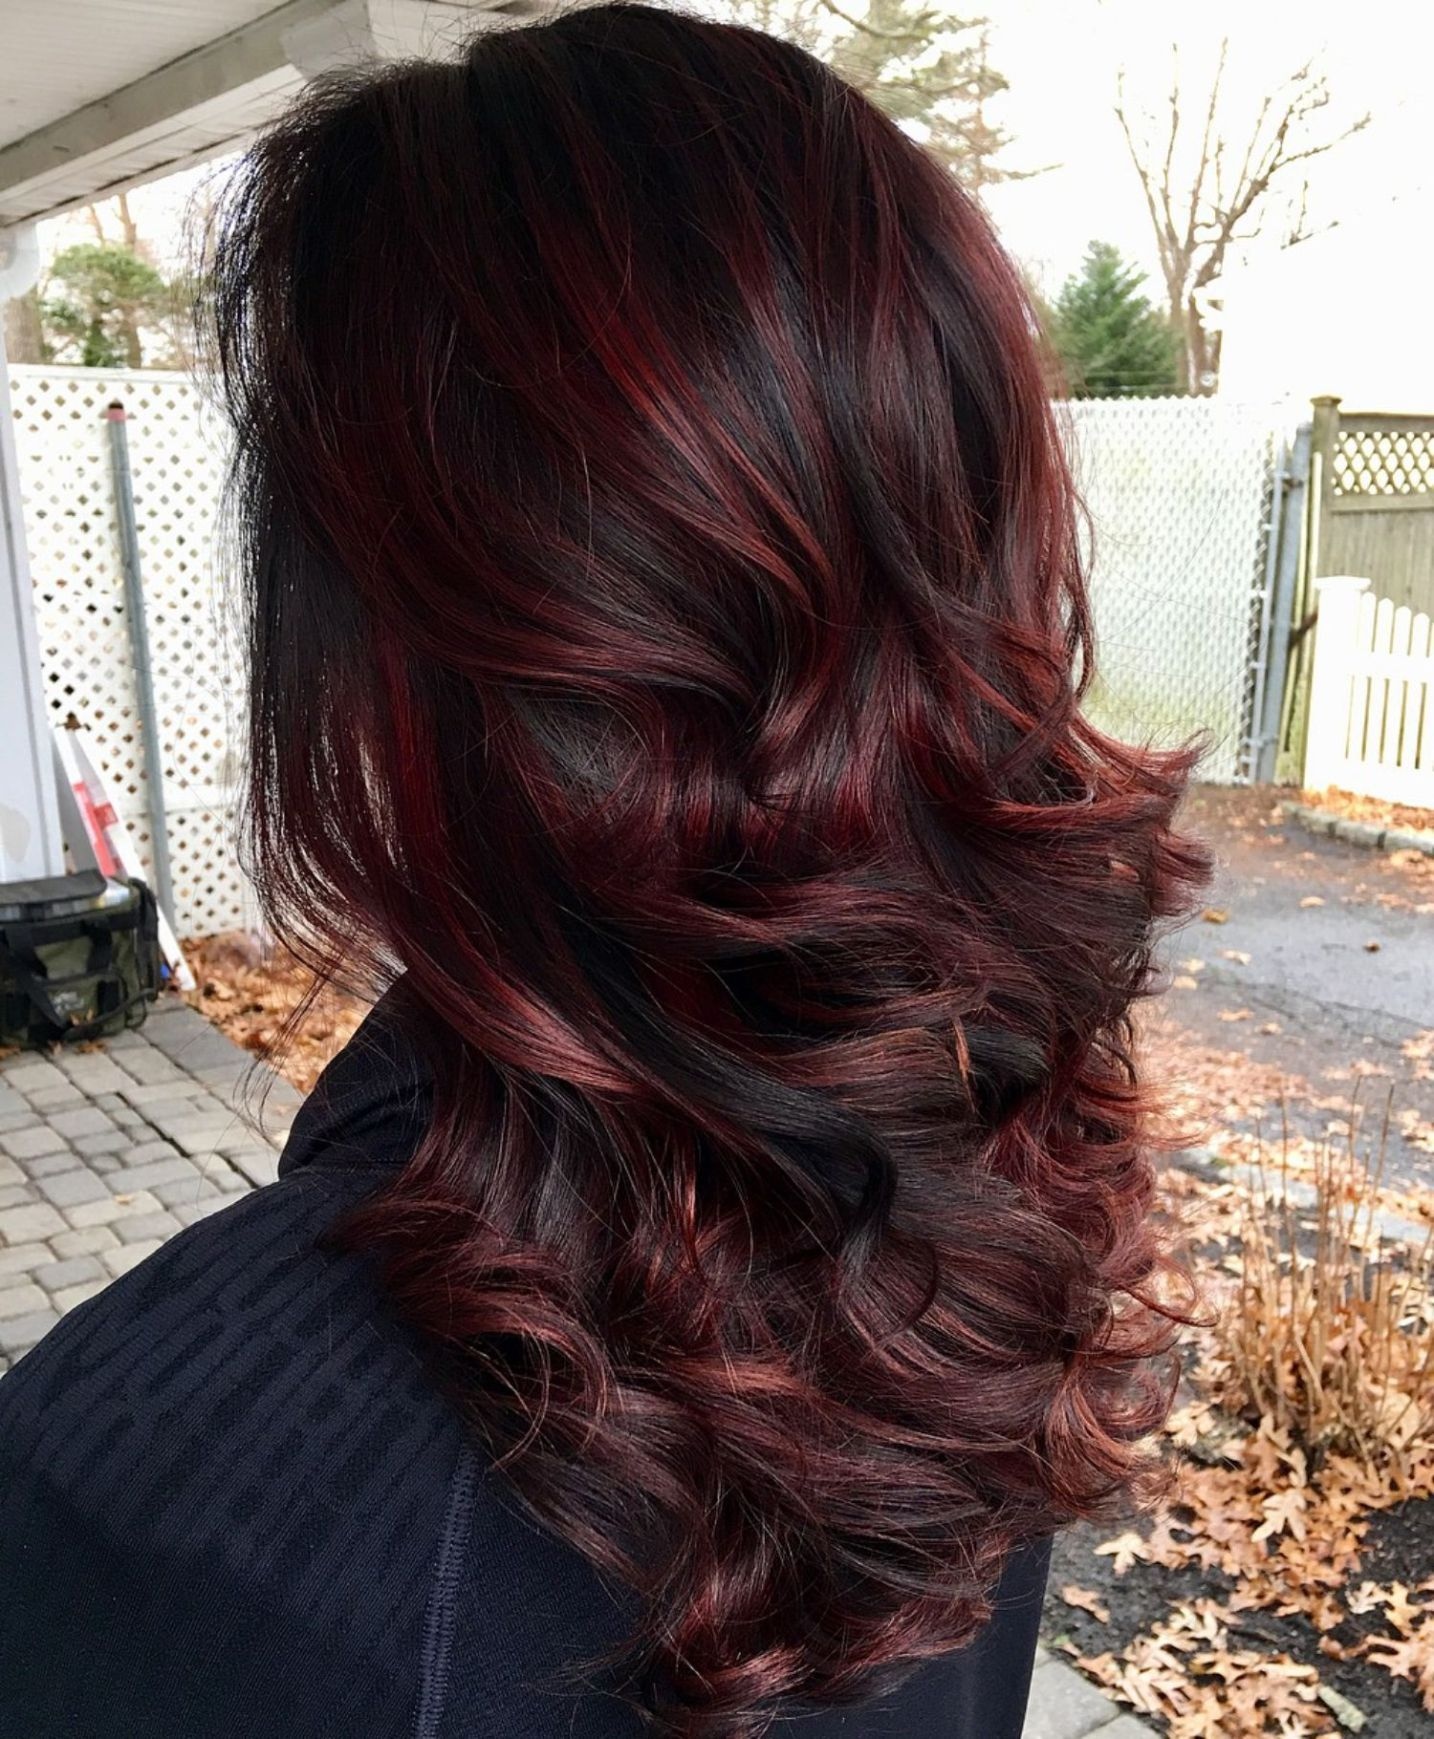 45 Shades Of Burgundy Hair Dark Burgundy Maroon Burgundy With Red Purple And Brown Highlights Dark Burgundy Hair Dark Burgundy Hair Color Wine Hair